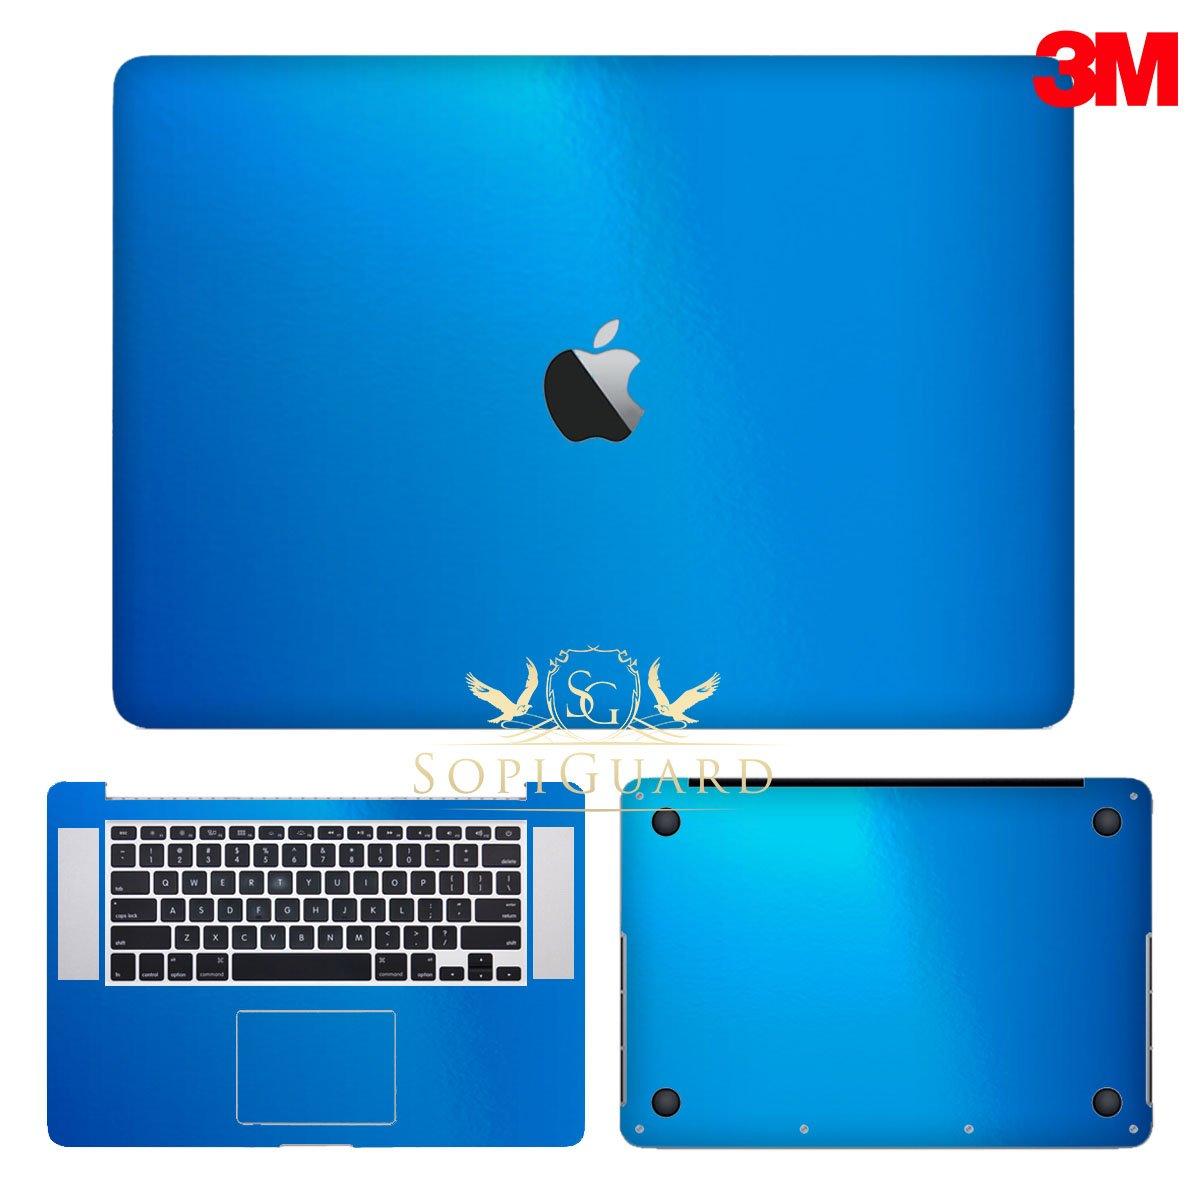 SopiGuard 3M Gloss Blue Precision Edge-to-Edge Coverage Vinyl Sticker Skin for Apple Macbook Pro 15 Retina (A1398)